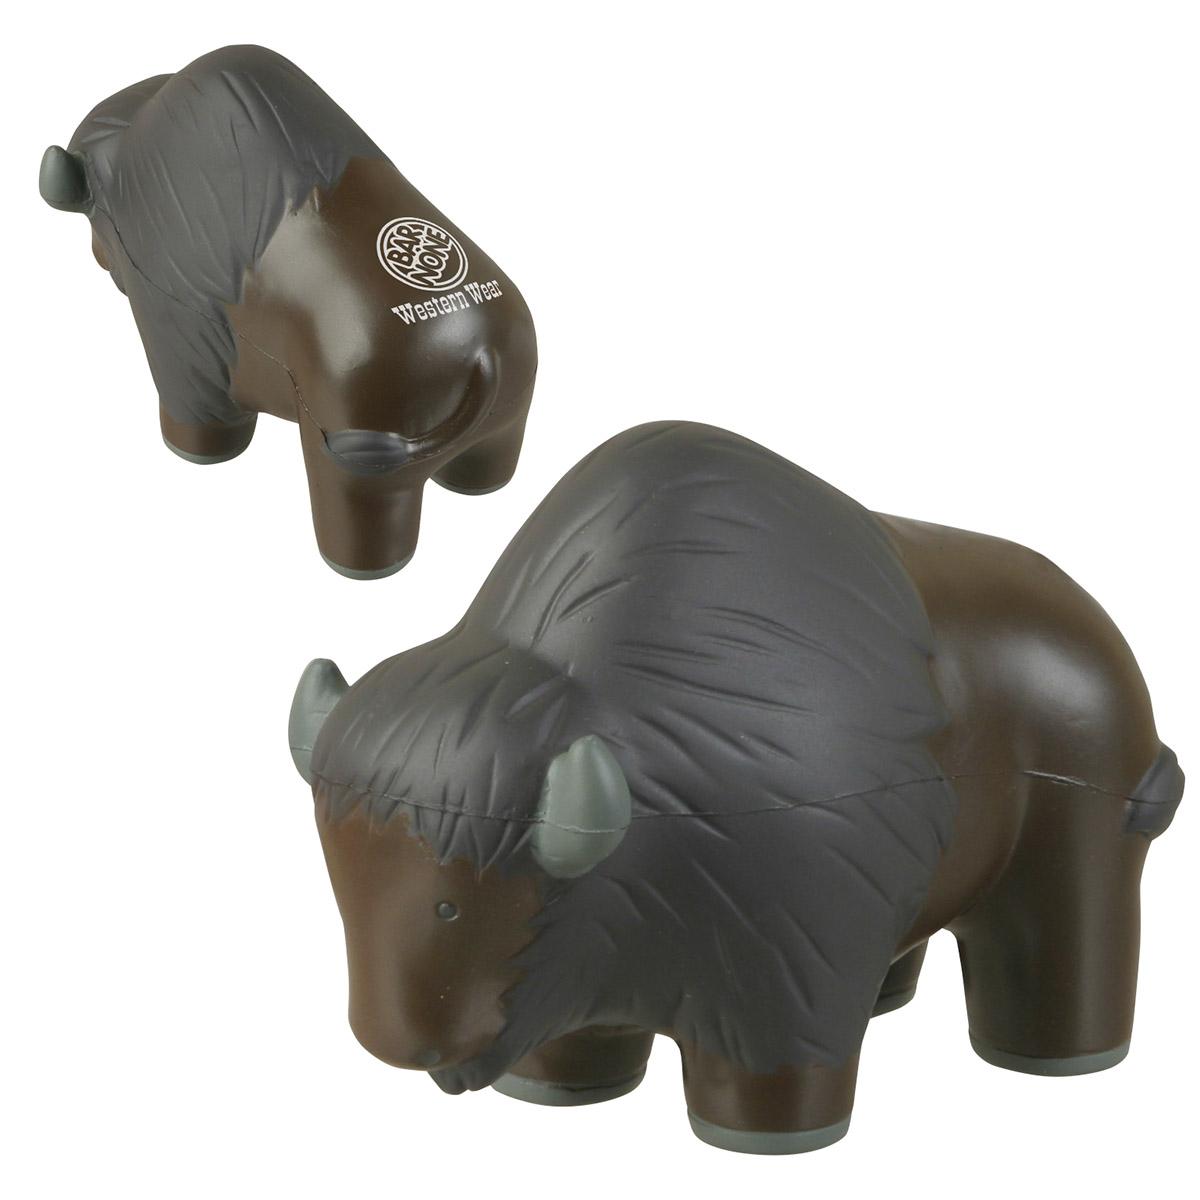 Buffalo Stress Reliever, LAZ-BU12 - 1 Colour Imprint